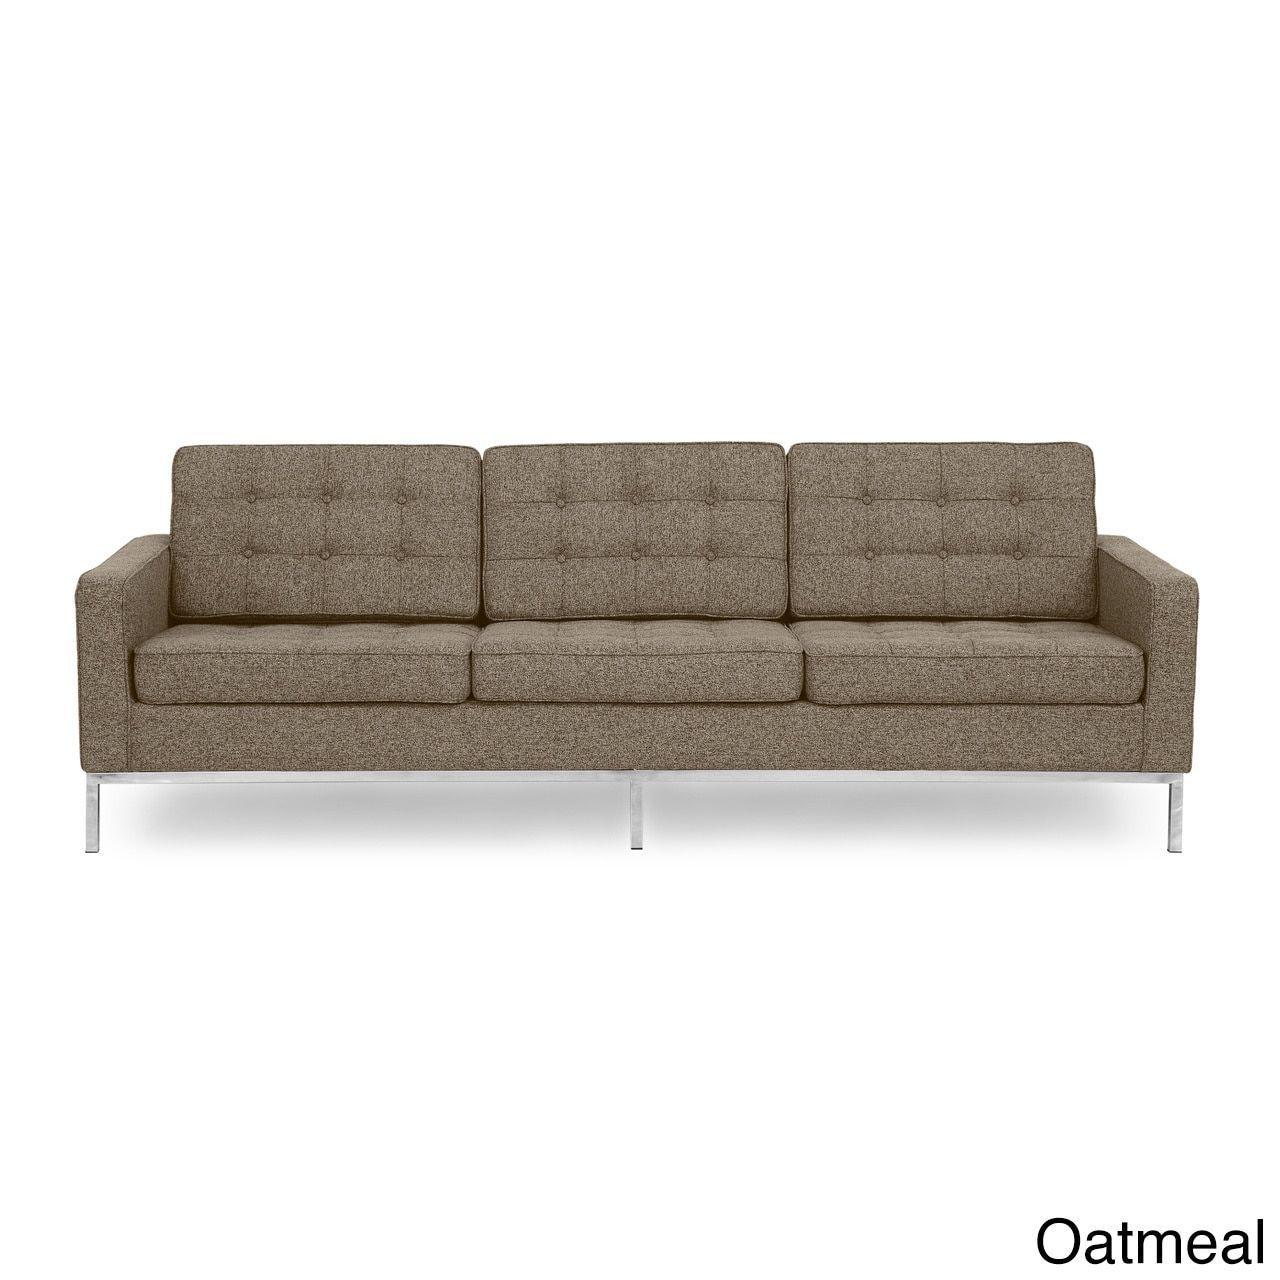 kardiel florence knoll style sofa 3 seat premium fabric upholstery rh za pinterest com